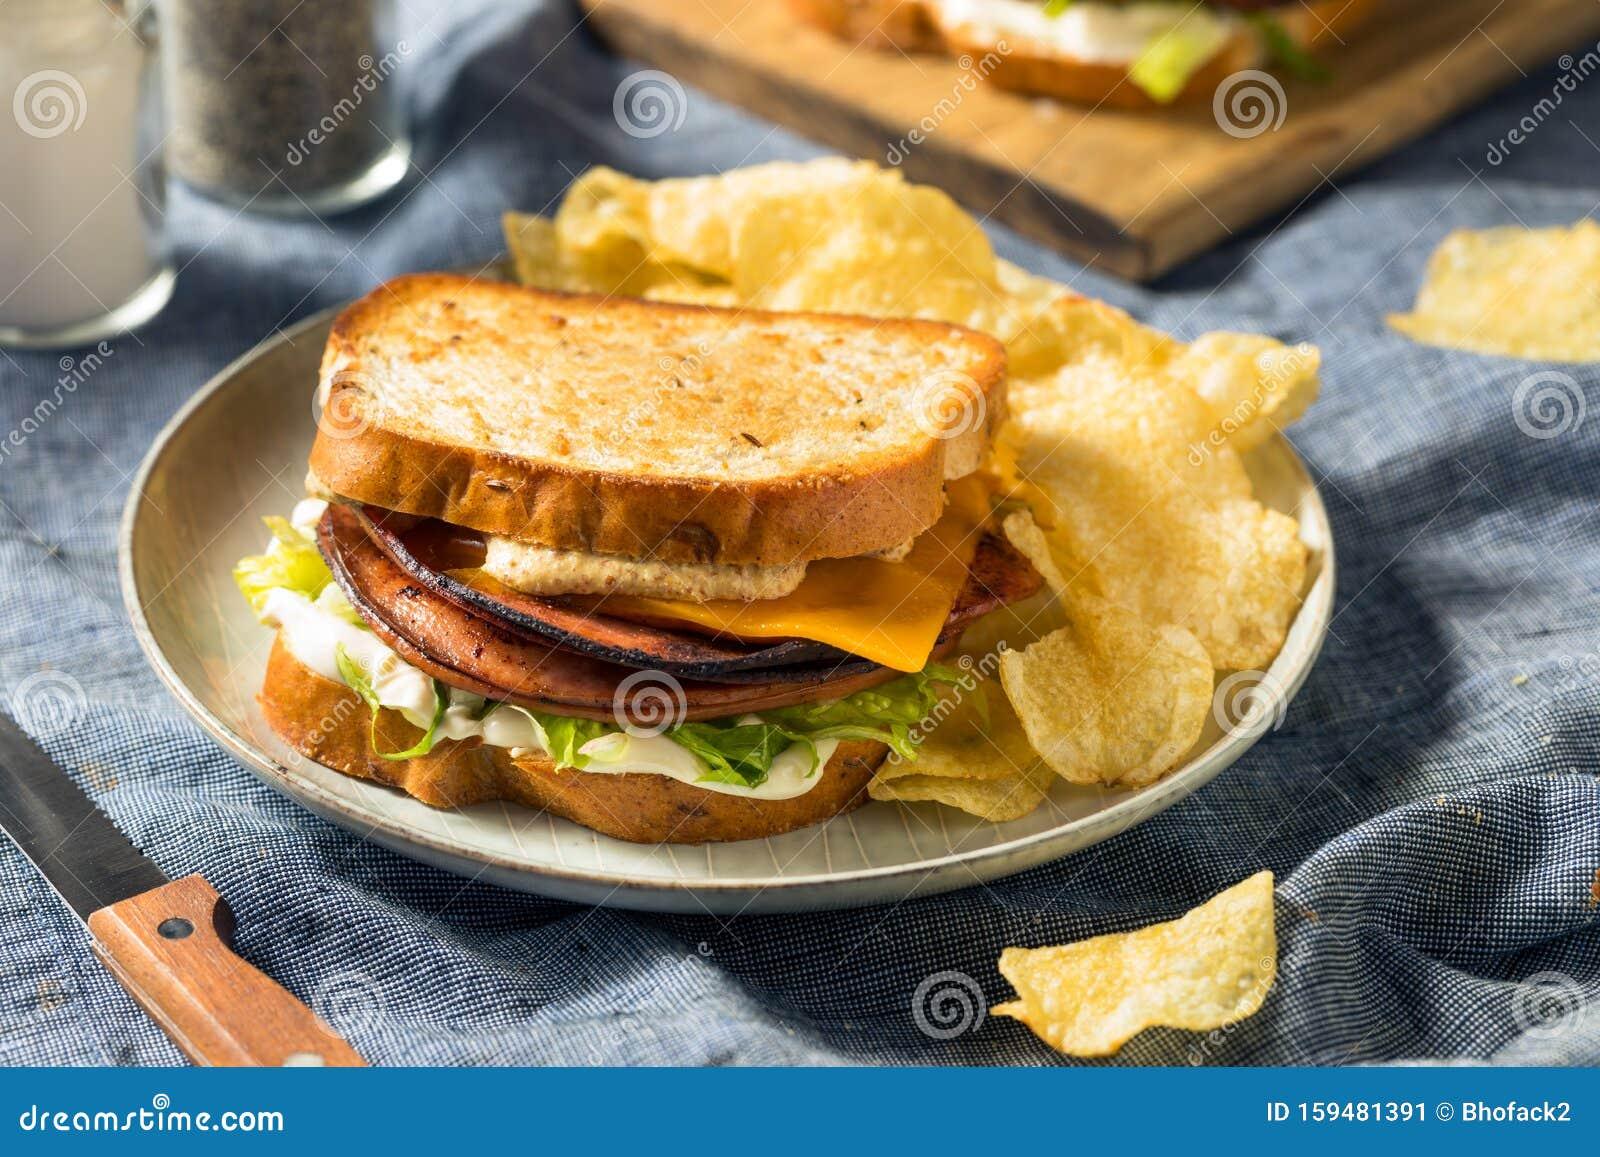 Homemade Fried Bologna Sandwich Stock Image - Image of ...